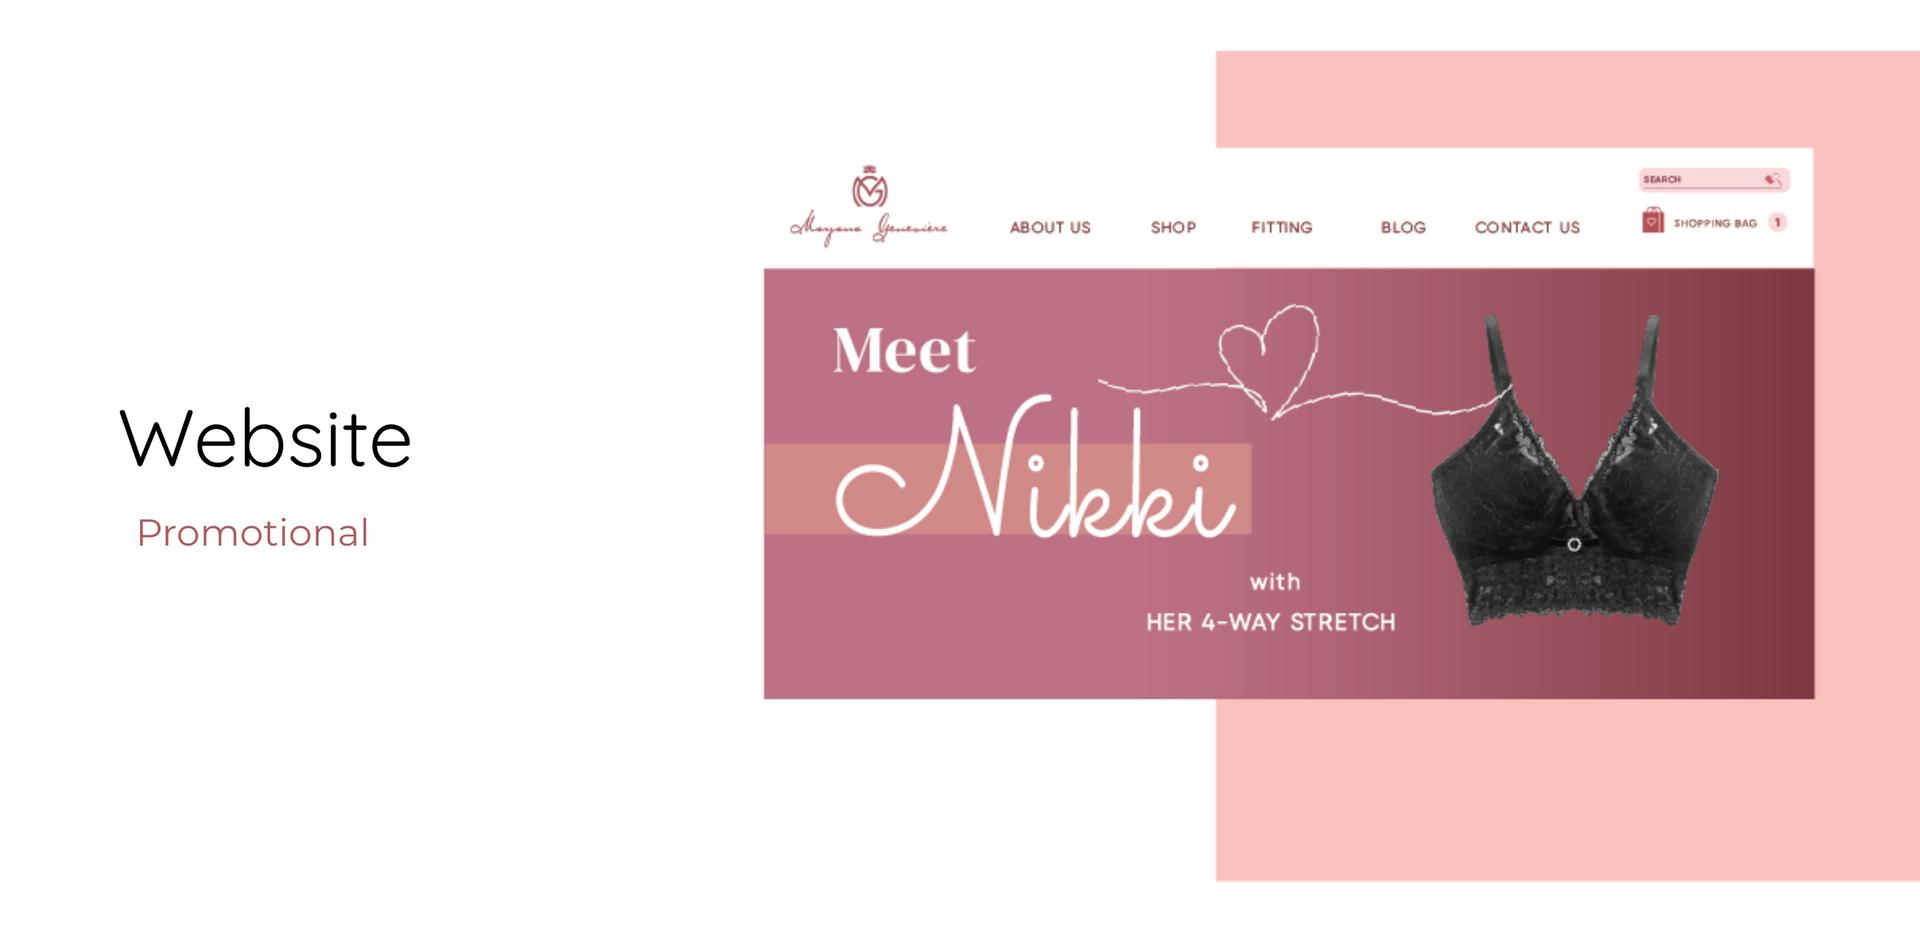 mg-website3.png